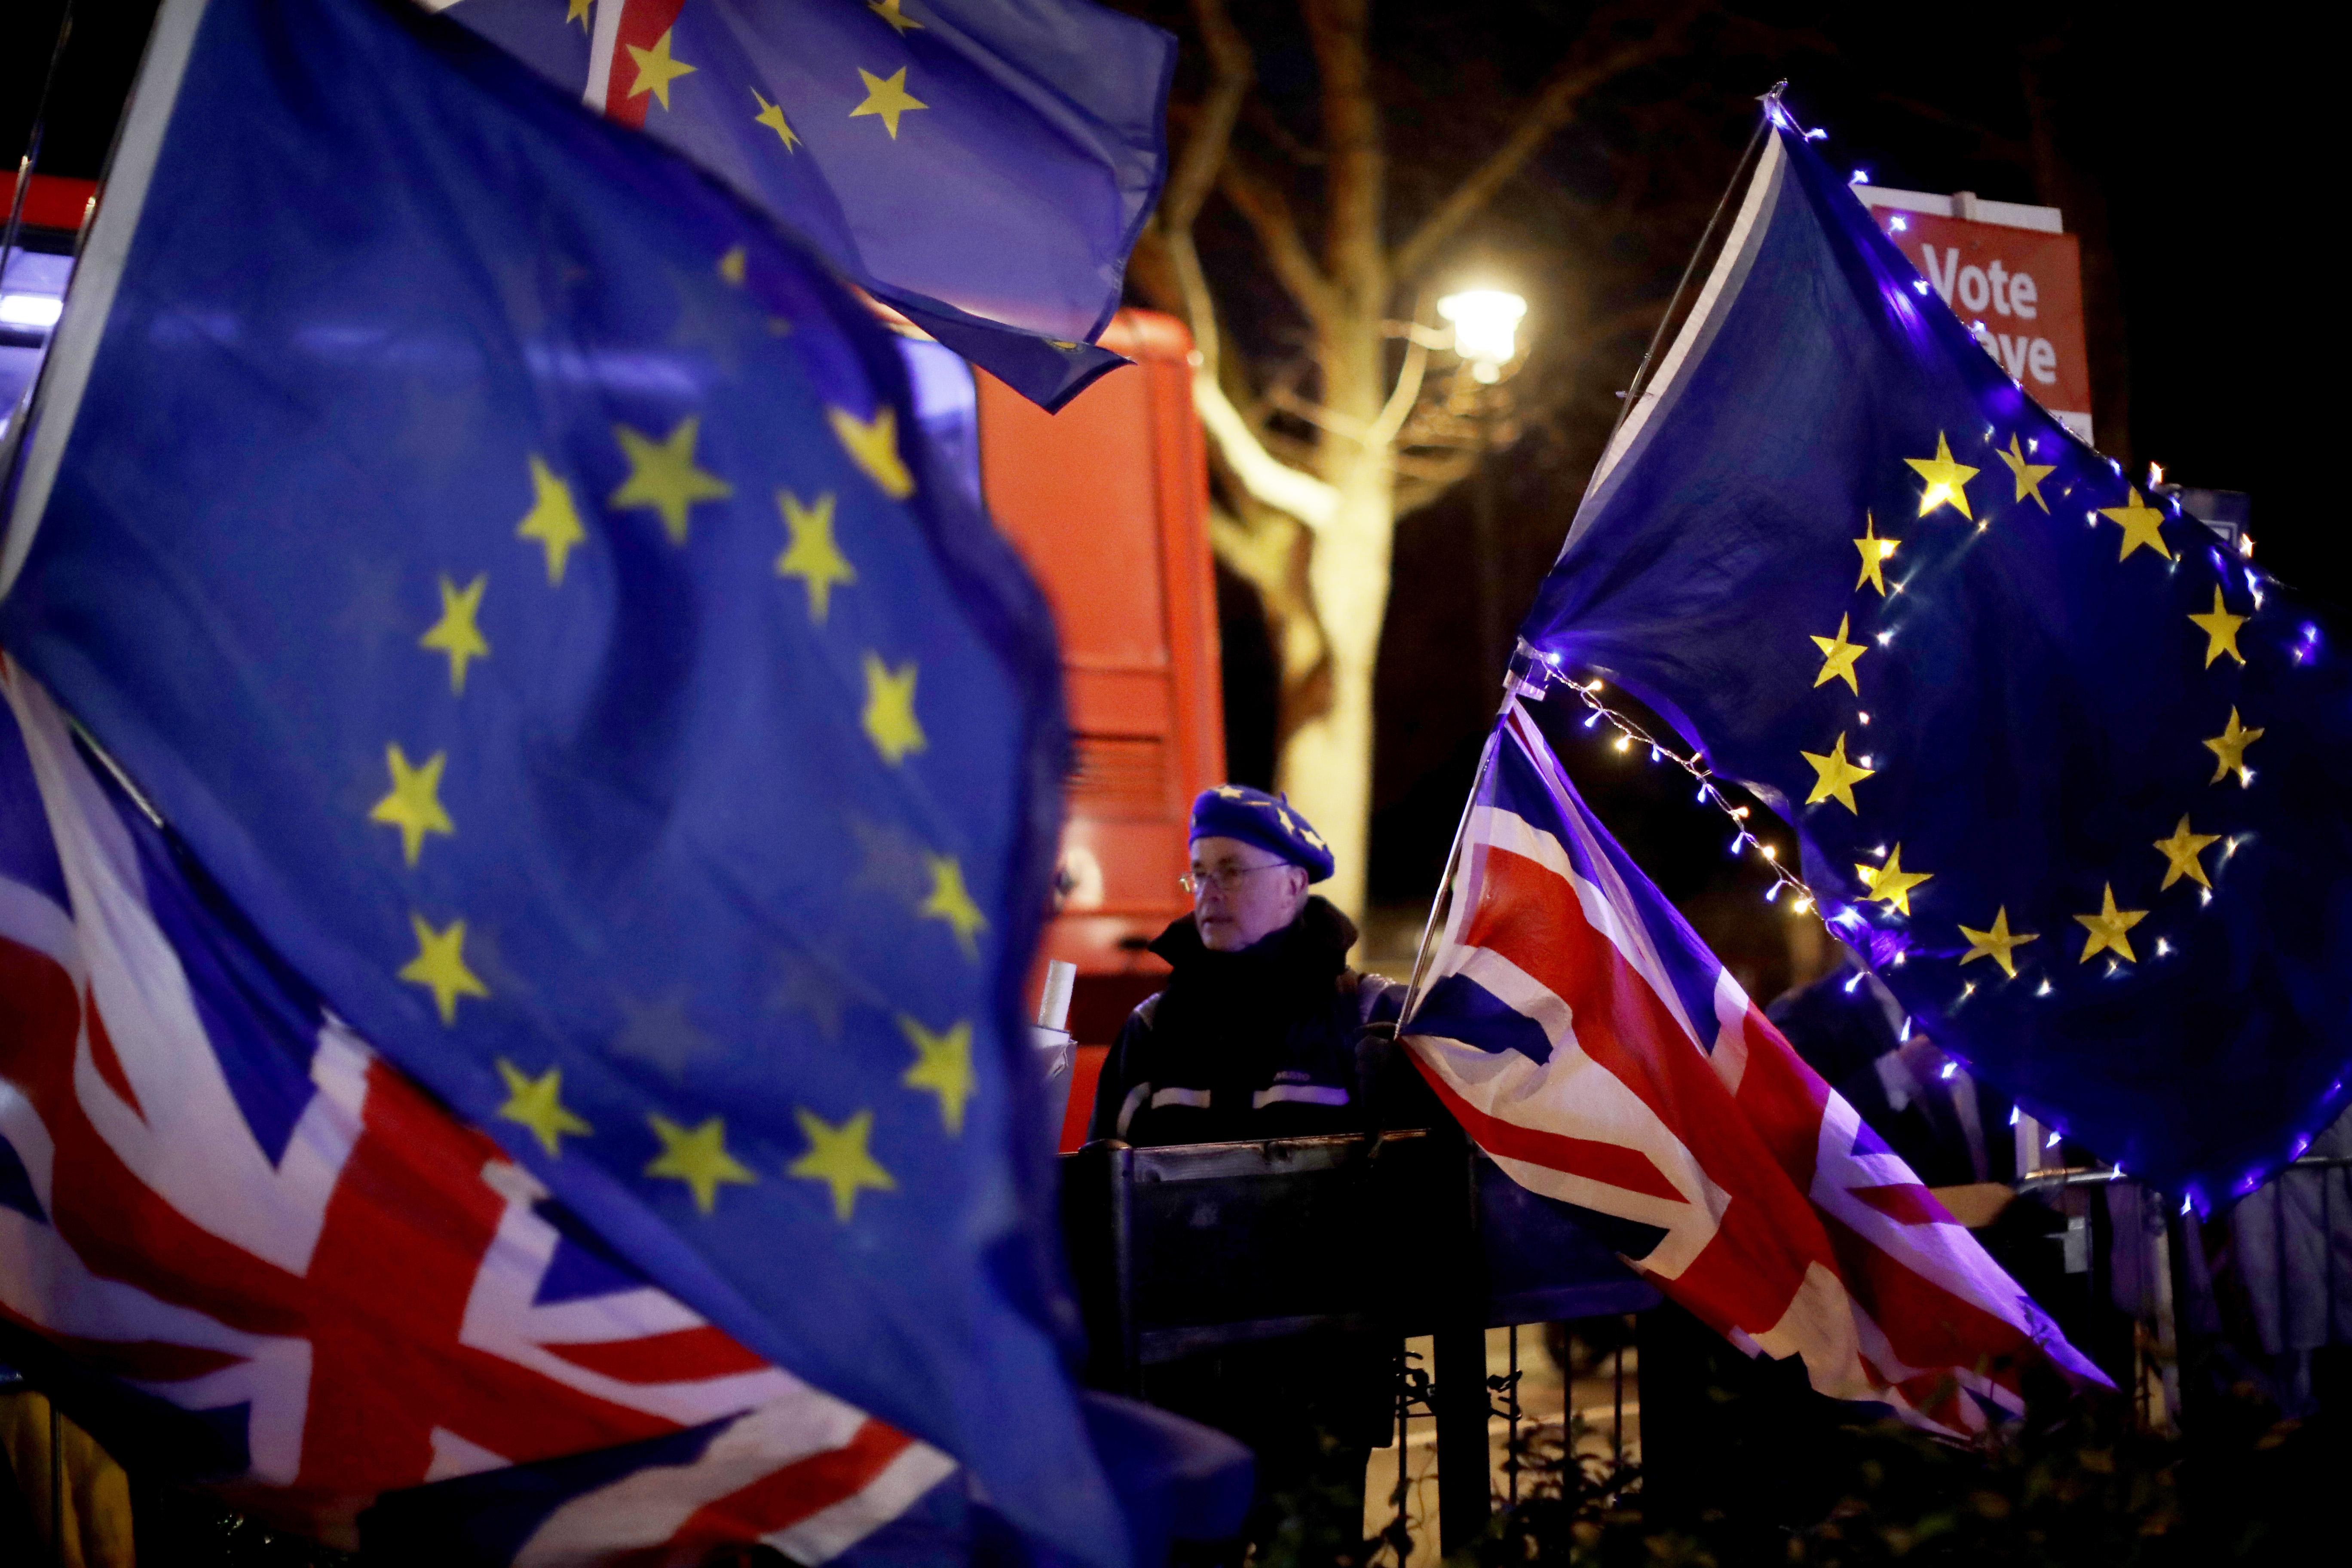 washingtonexaminer.com - Parliament goes chicken on Brexit